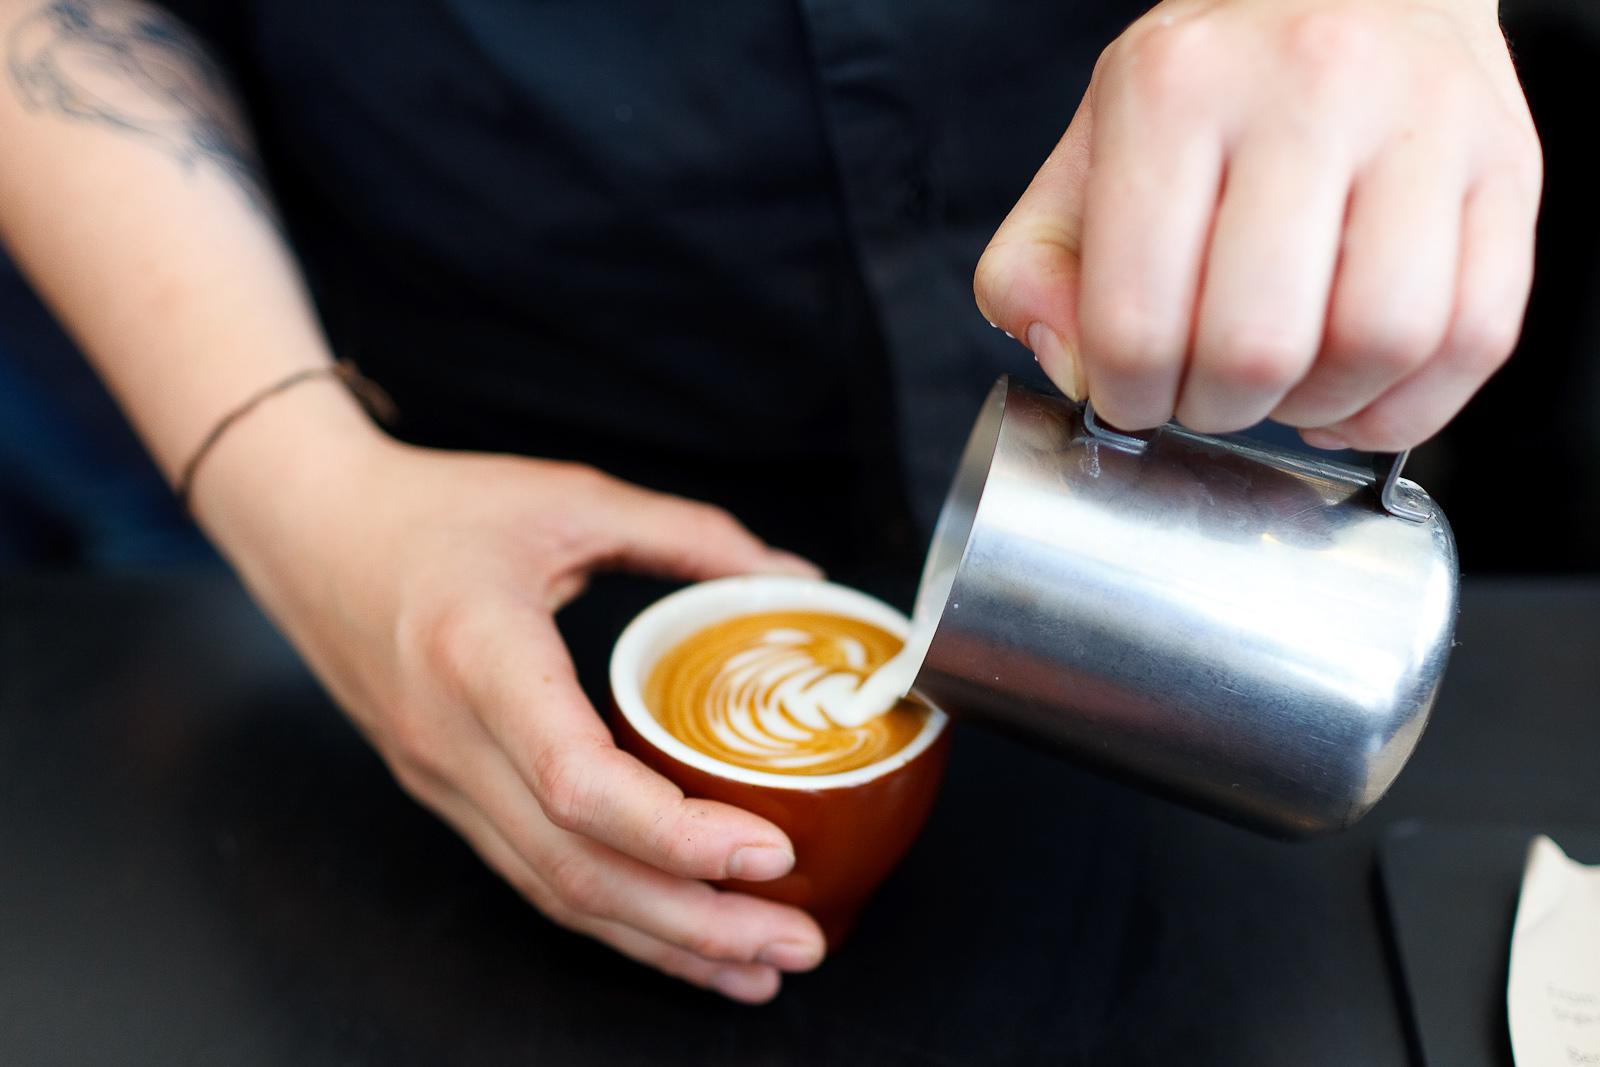 Pouring a cappuccino ($3.25)